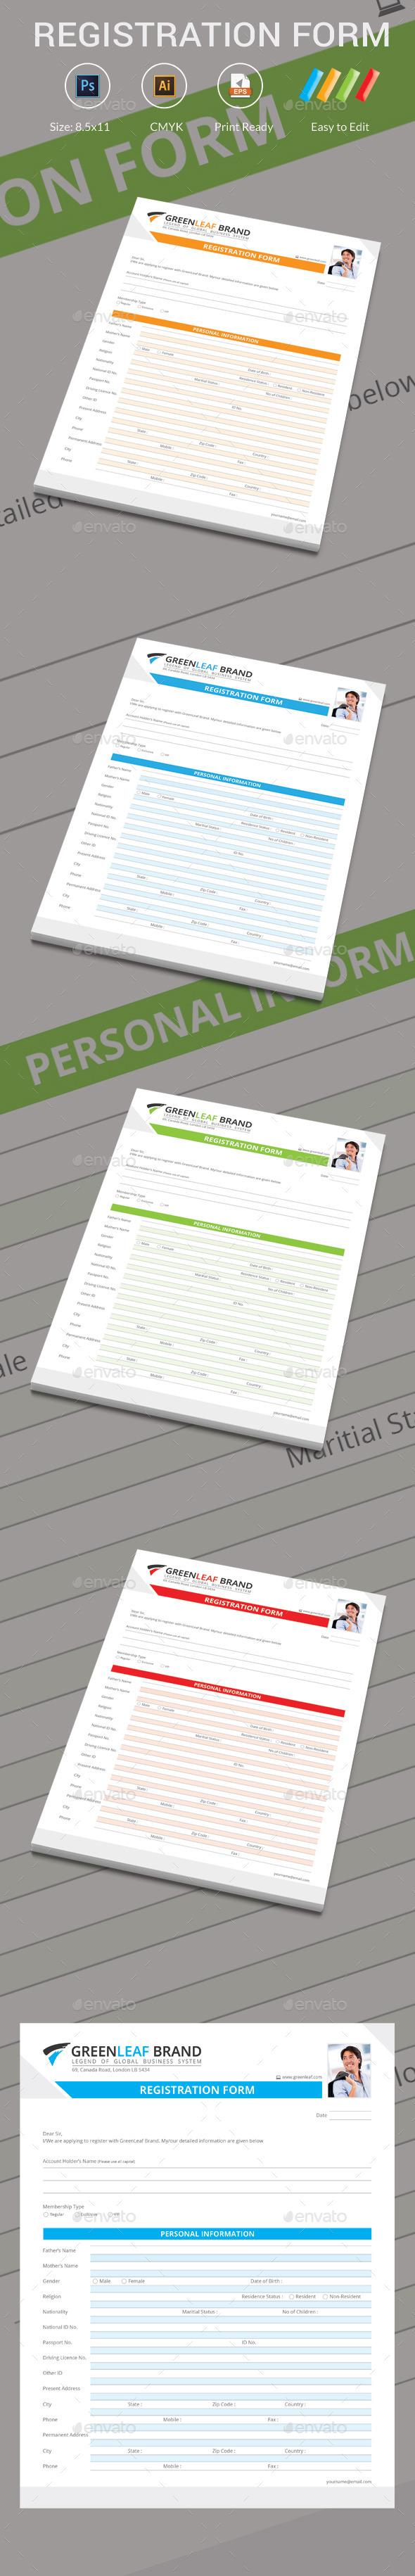 GraphicRiver Registration Form 10364912